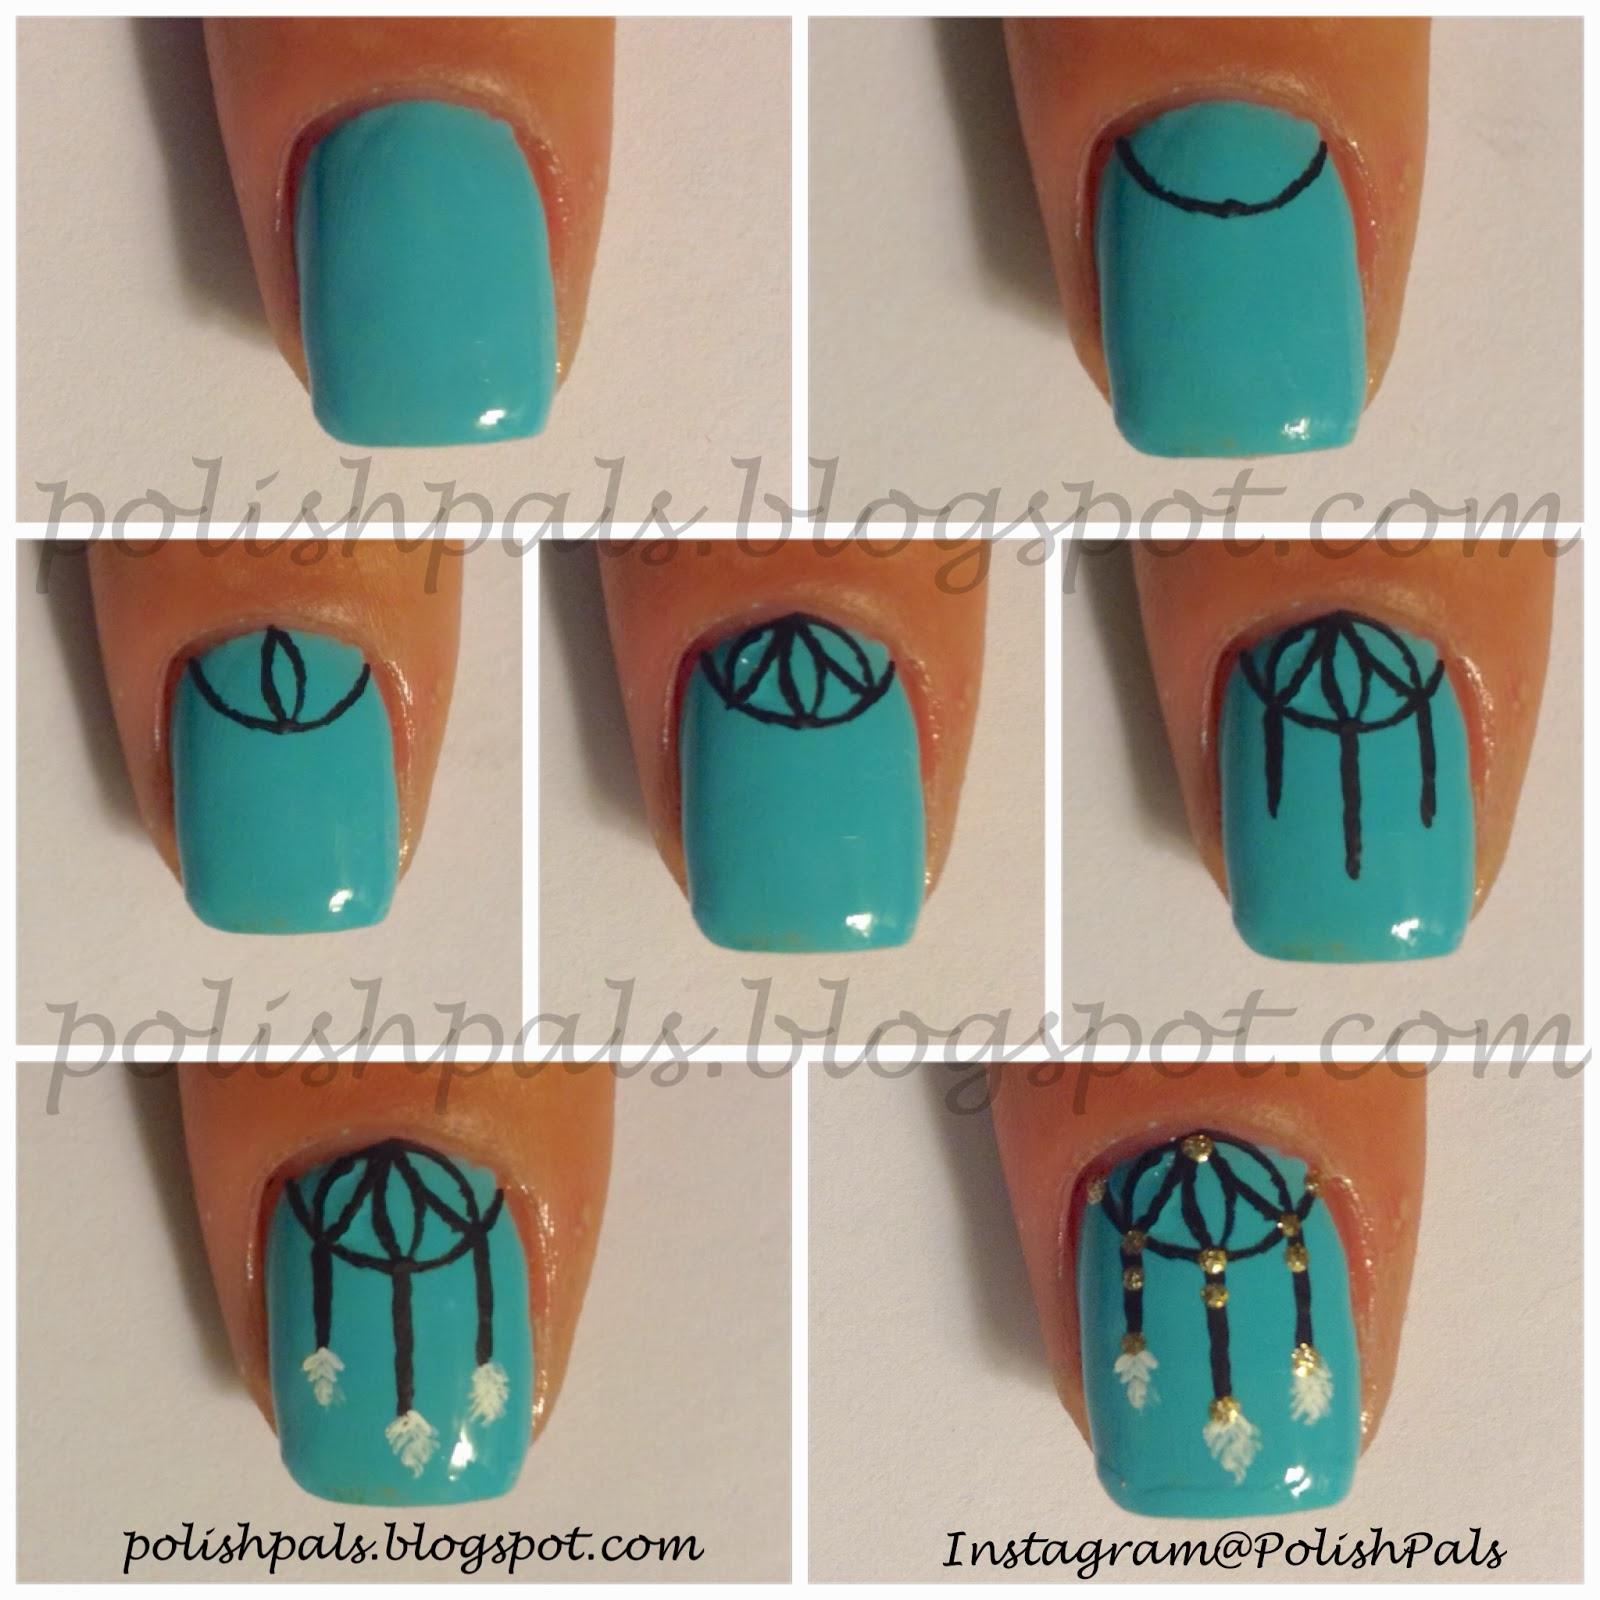 Dreamcatcher nails tutorial